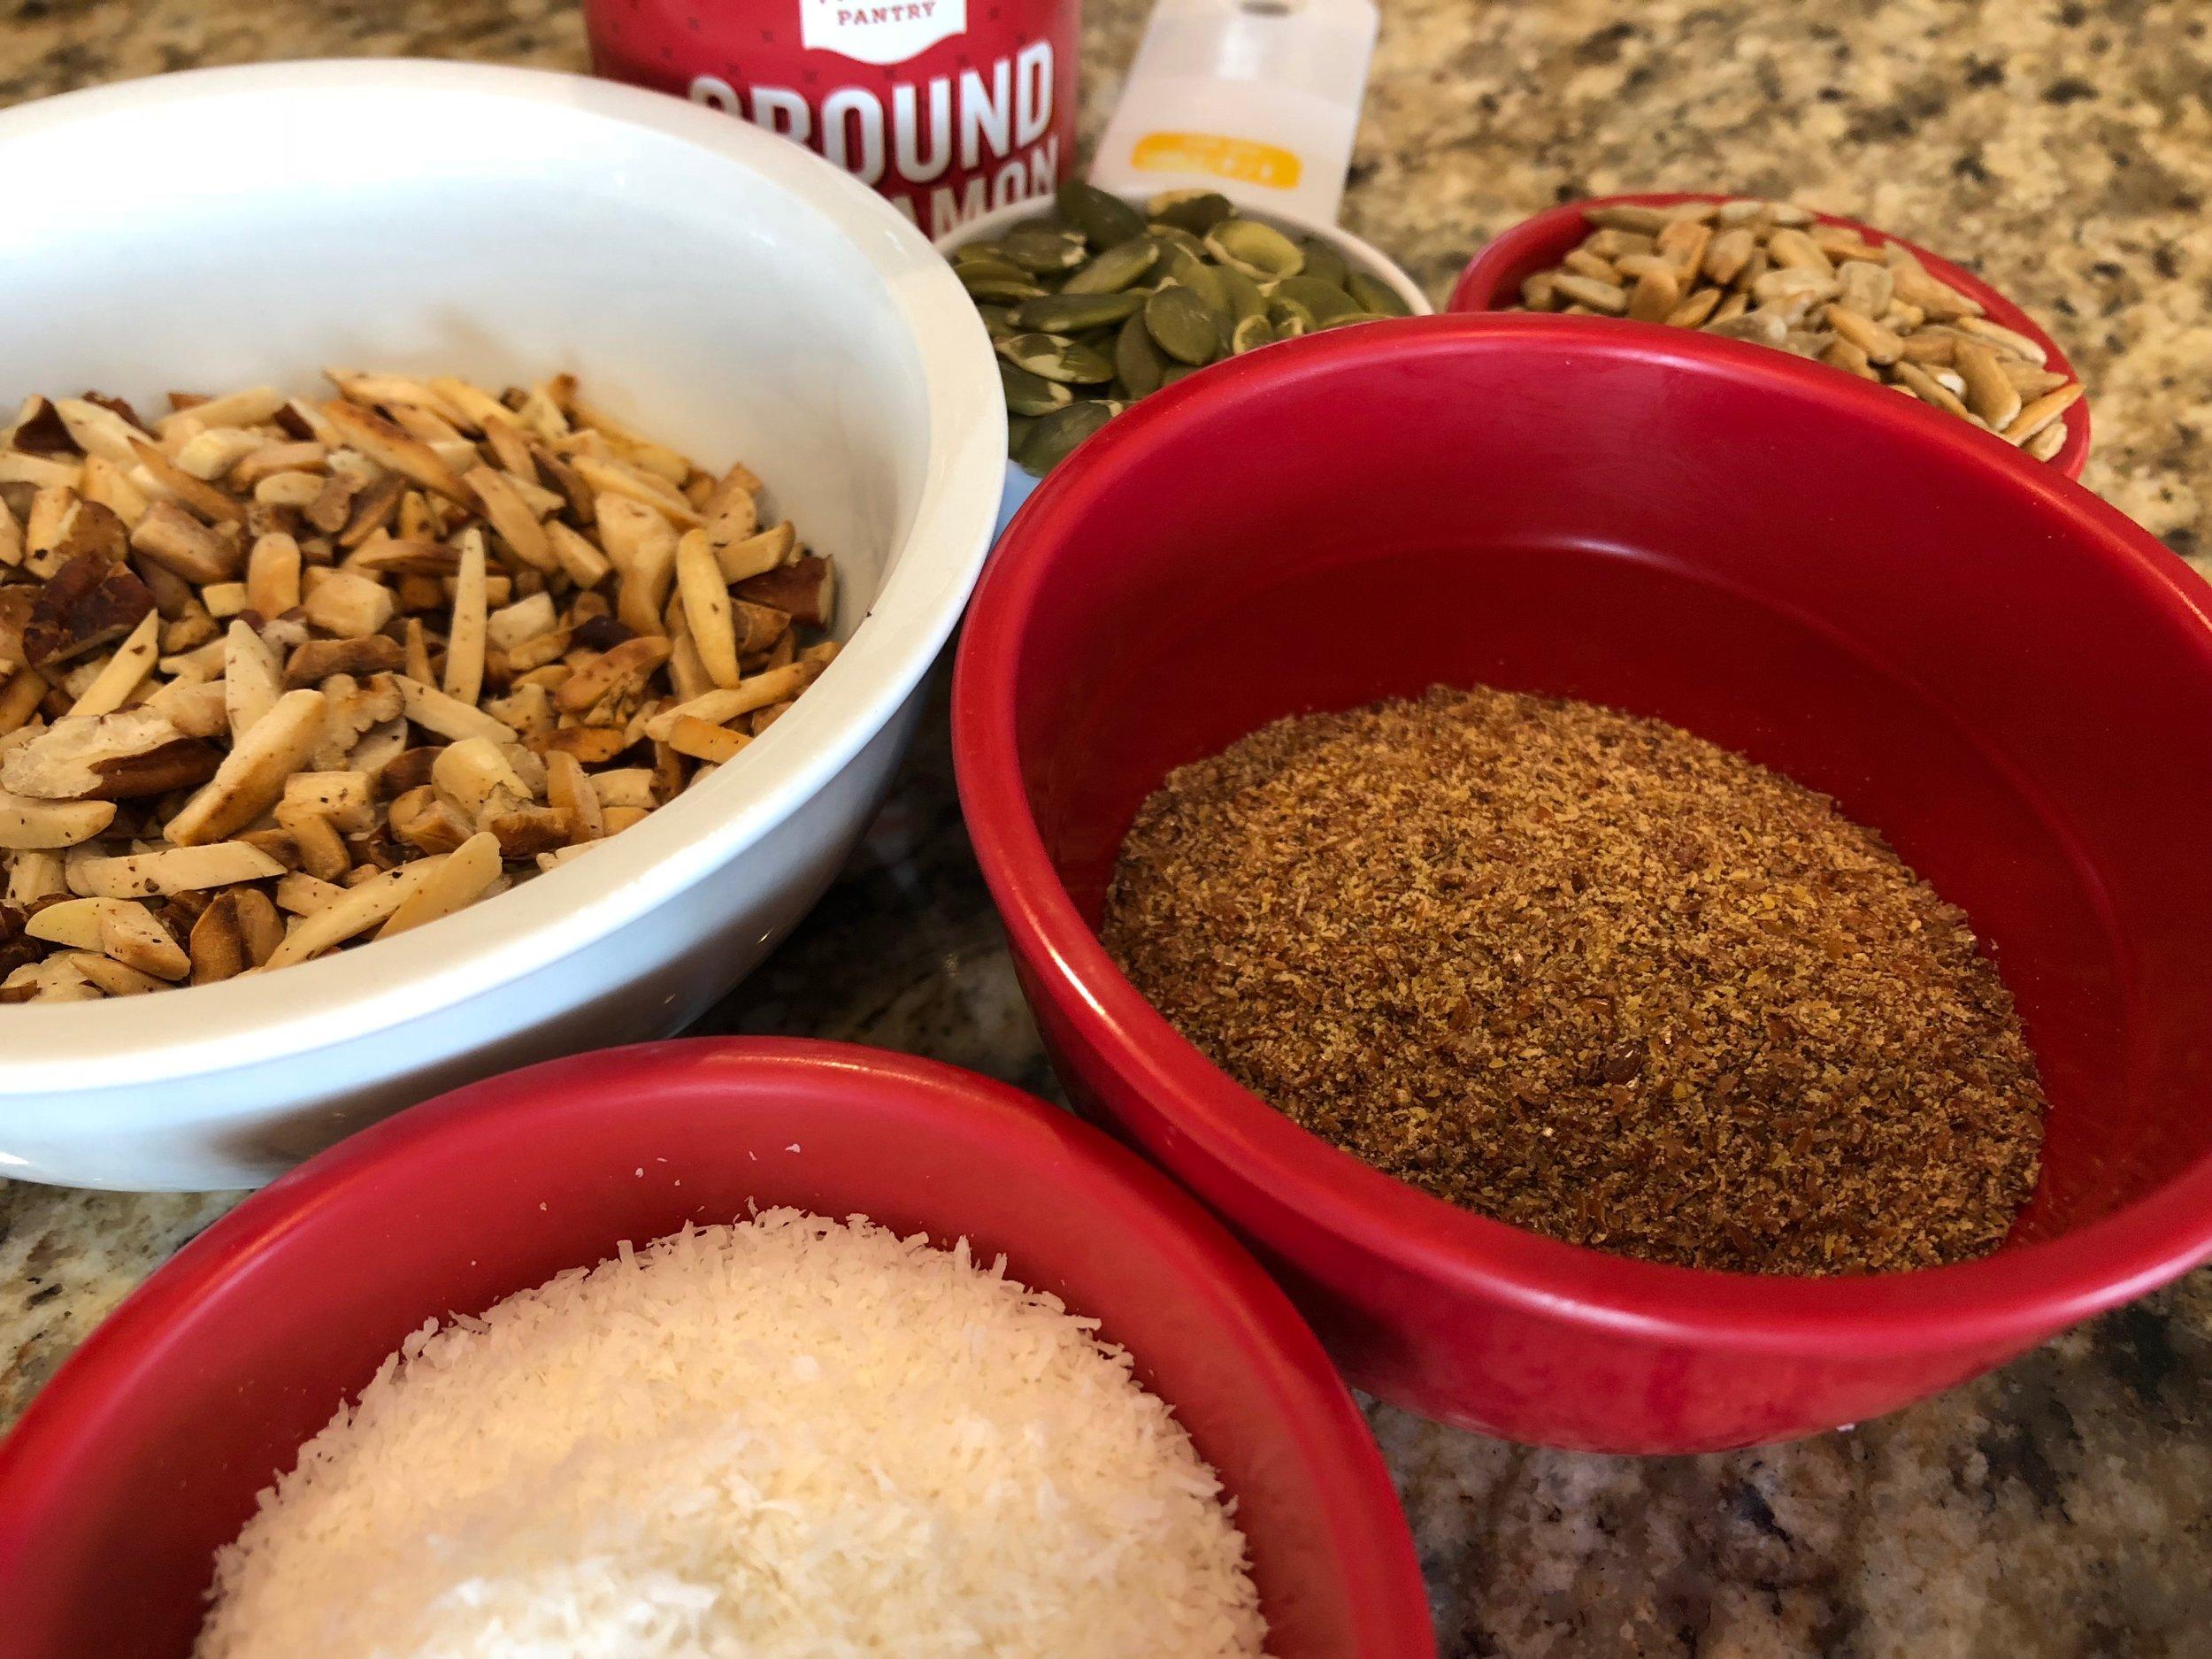 Keto Granola Bar Low carb snack recipe